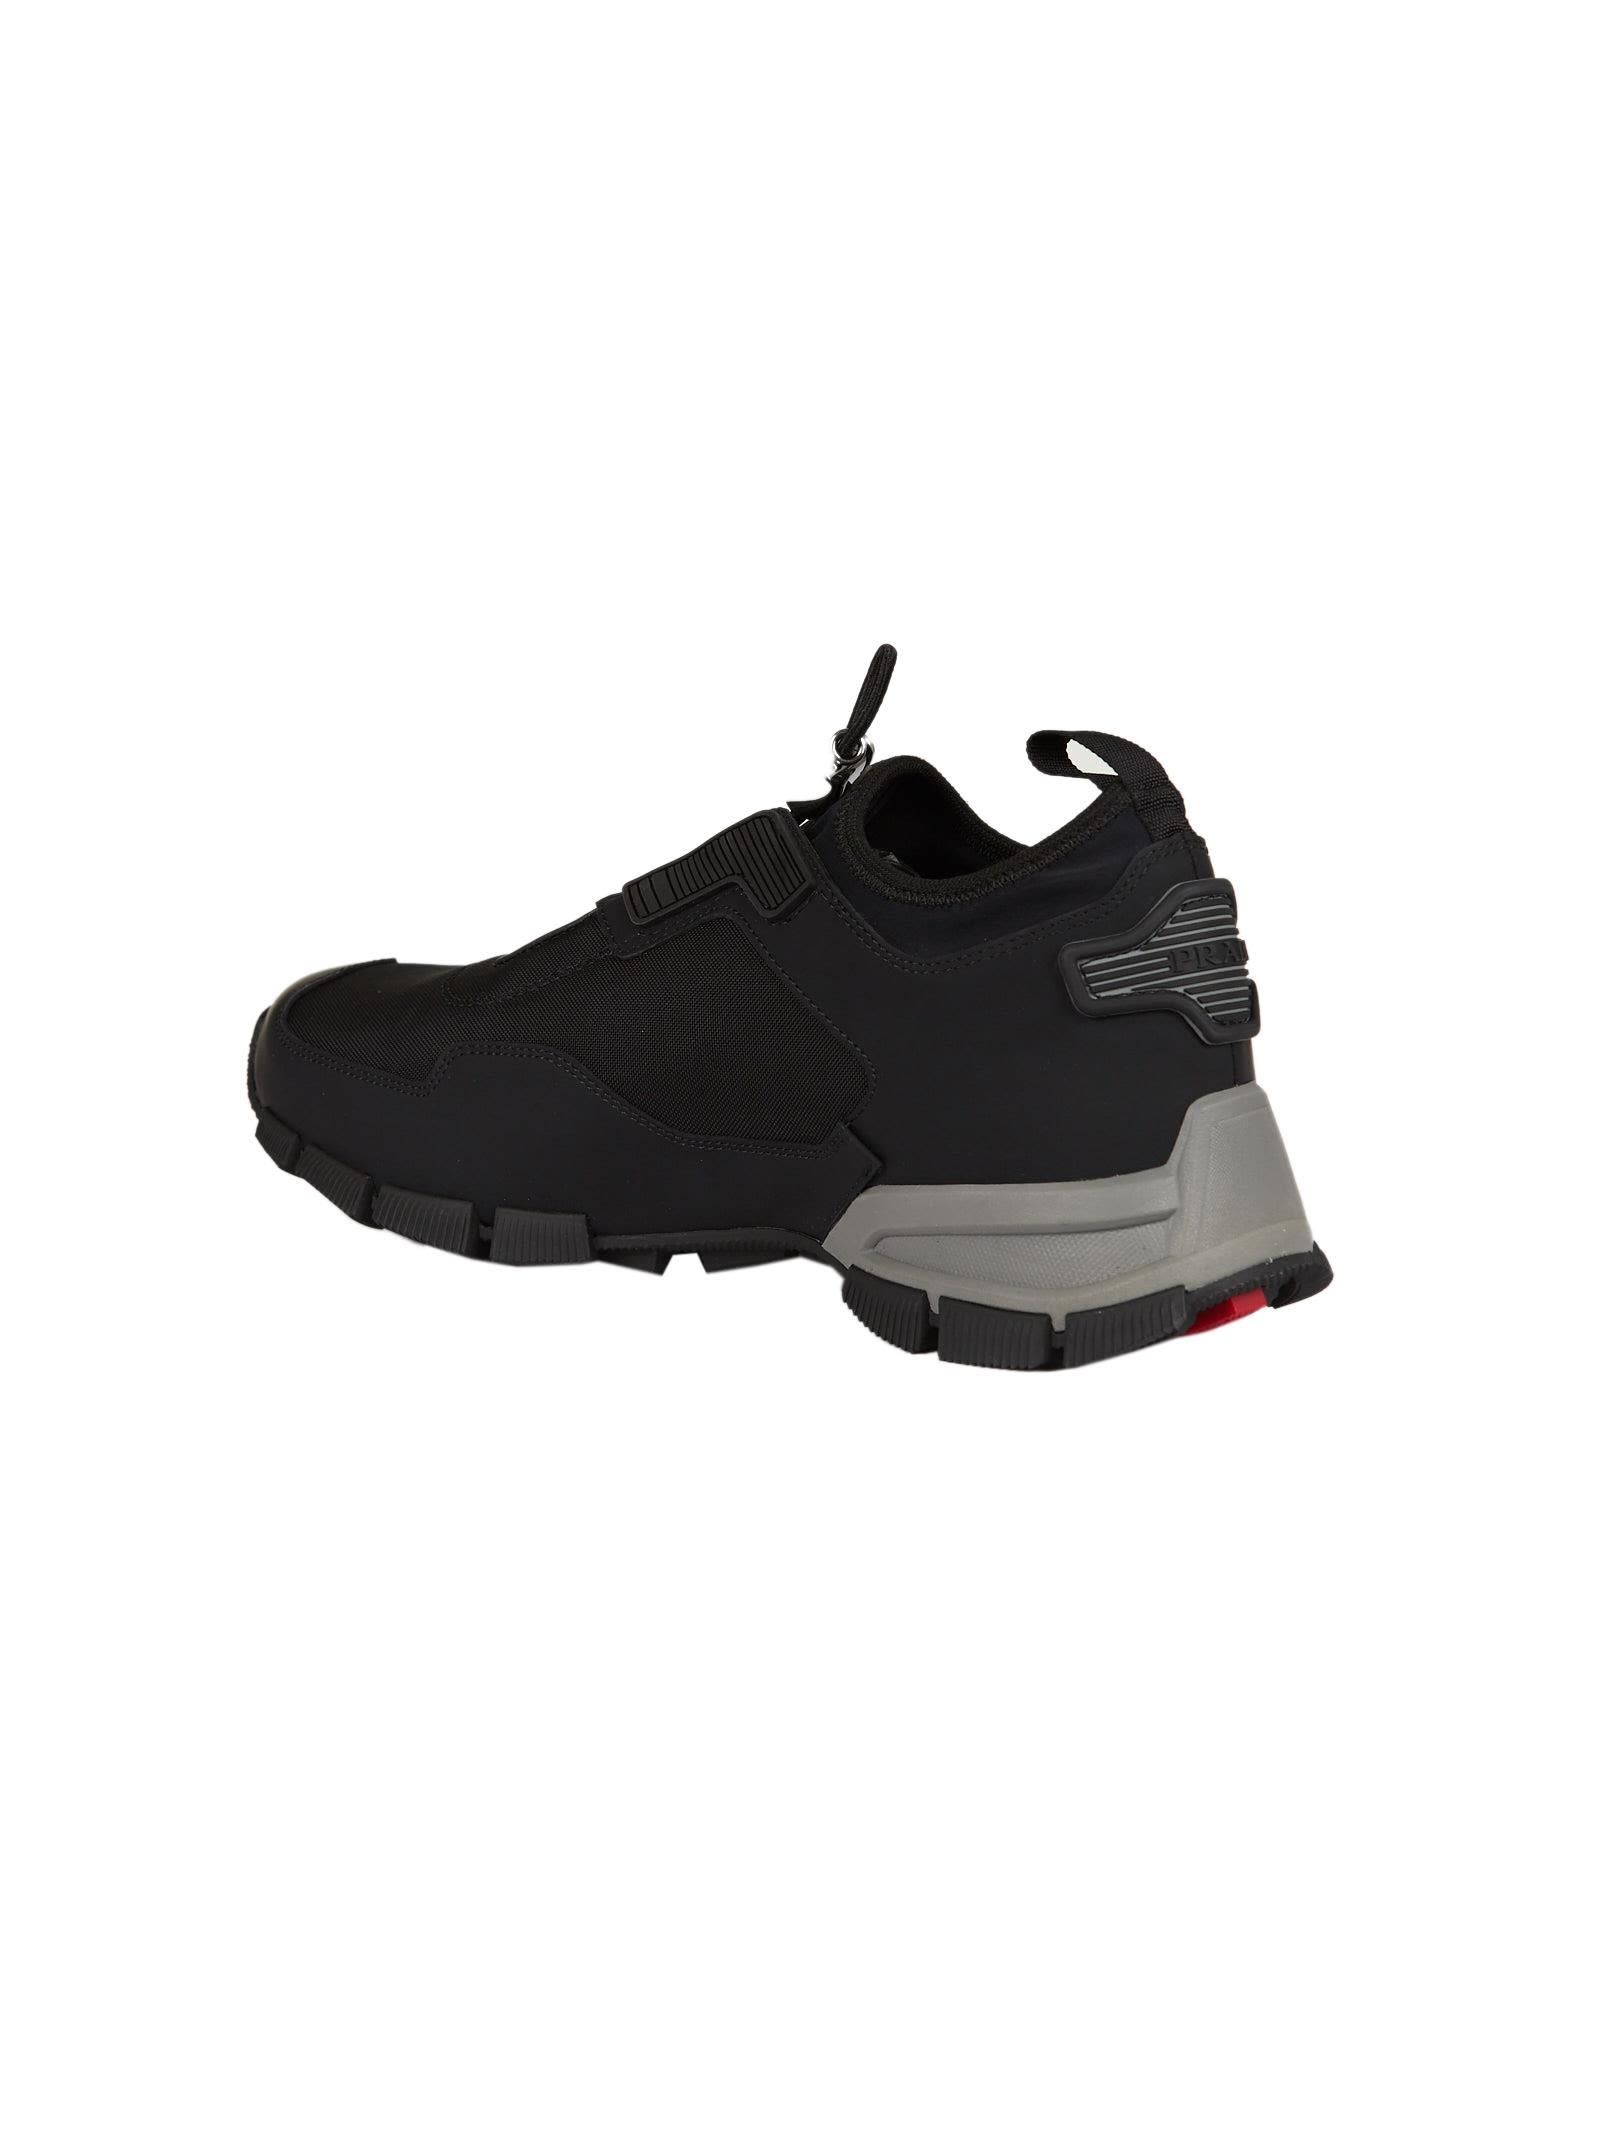 Trail concealed lace-up sneakers - Black Prada 68D9bG